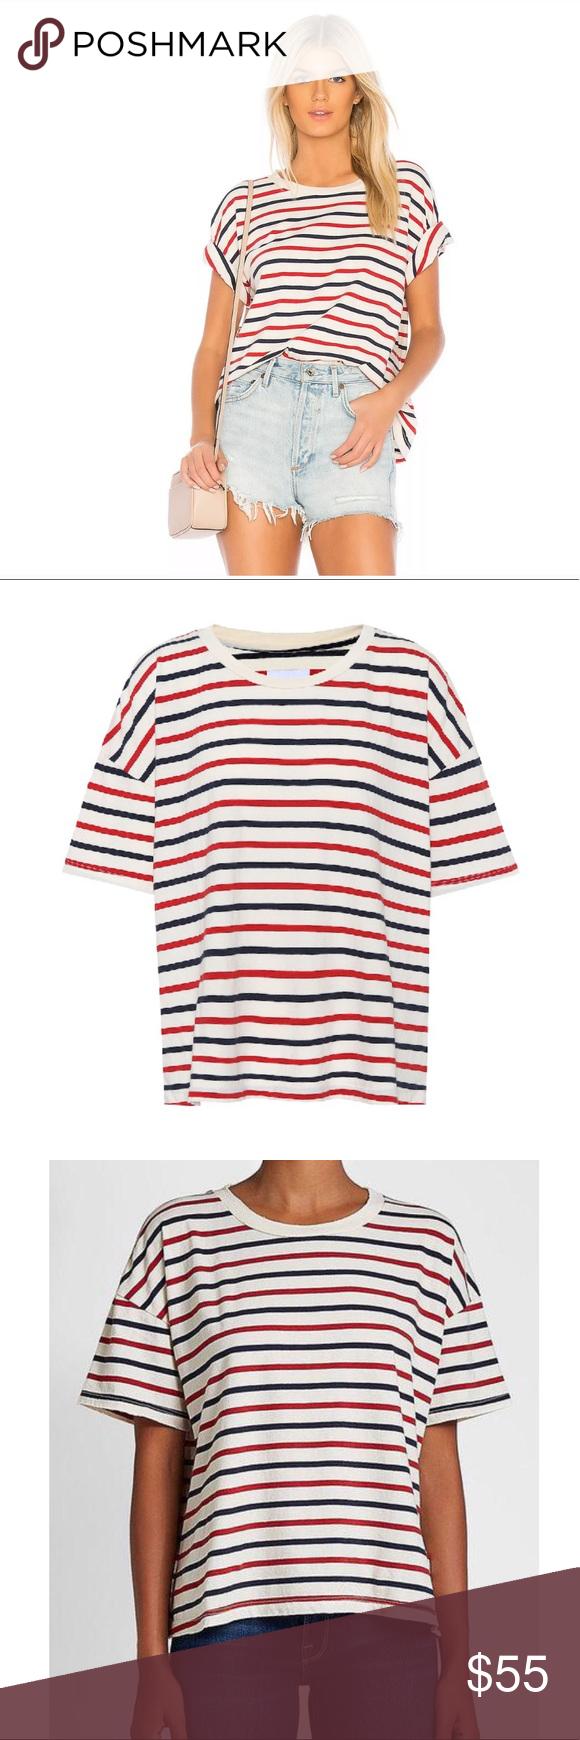 Current/Elliott The Roadie Tee in stripe Sze 3 Clothes